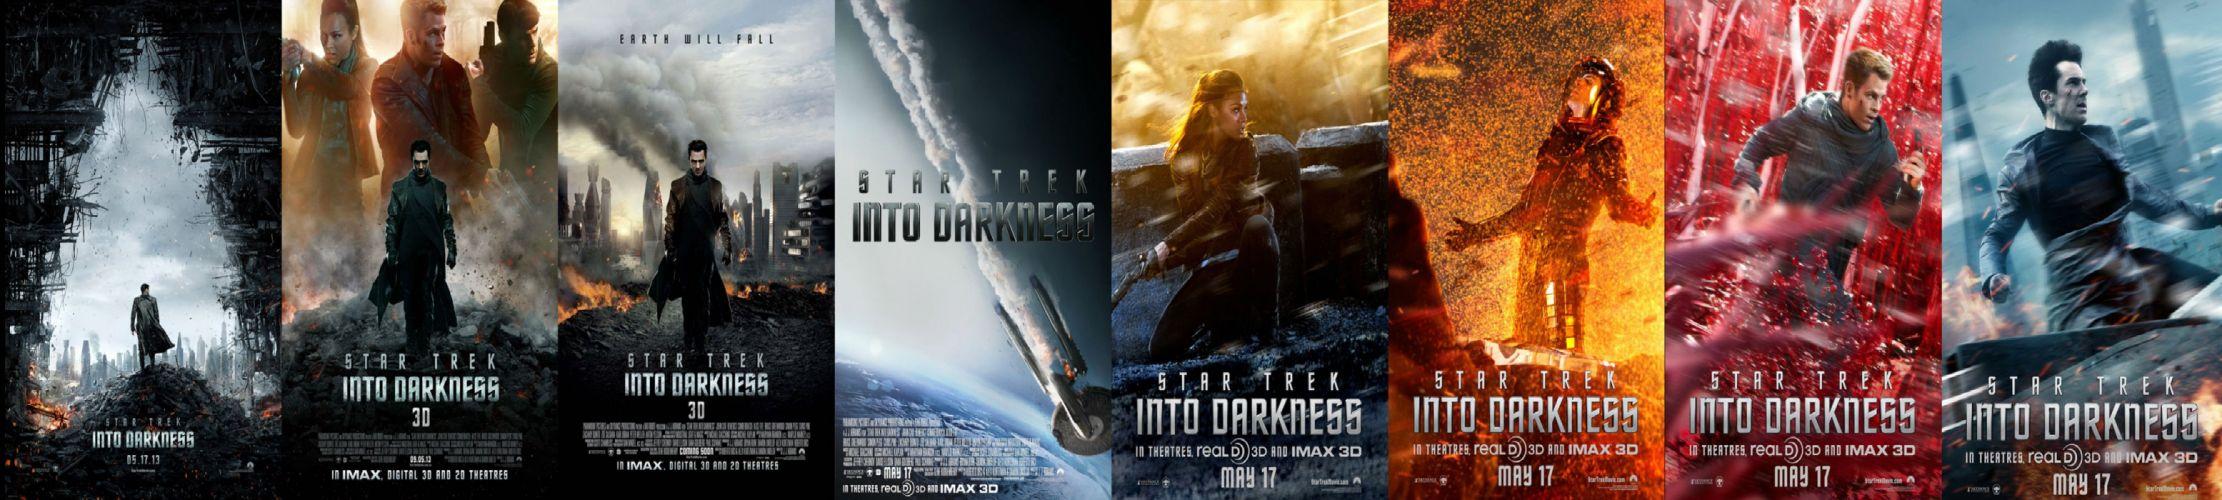 STAR-TREK-INTO-DARKNESS action sci-fi star trek darkness (53) wallpaper